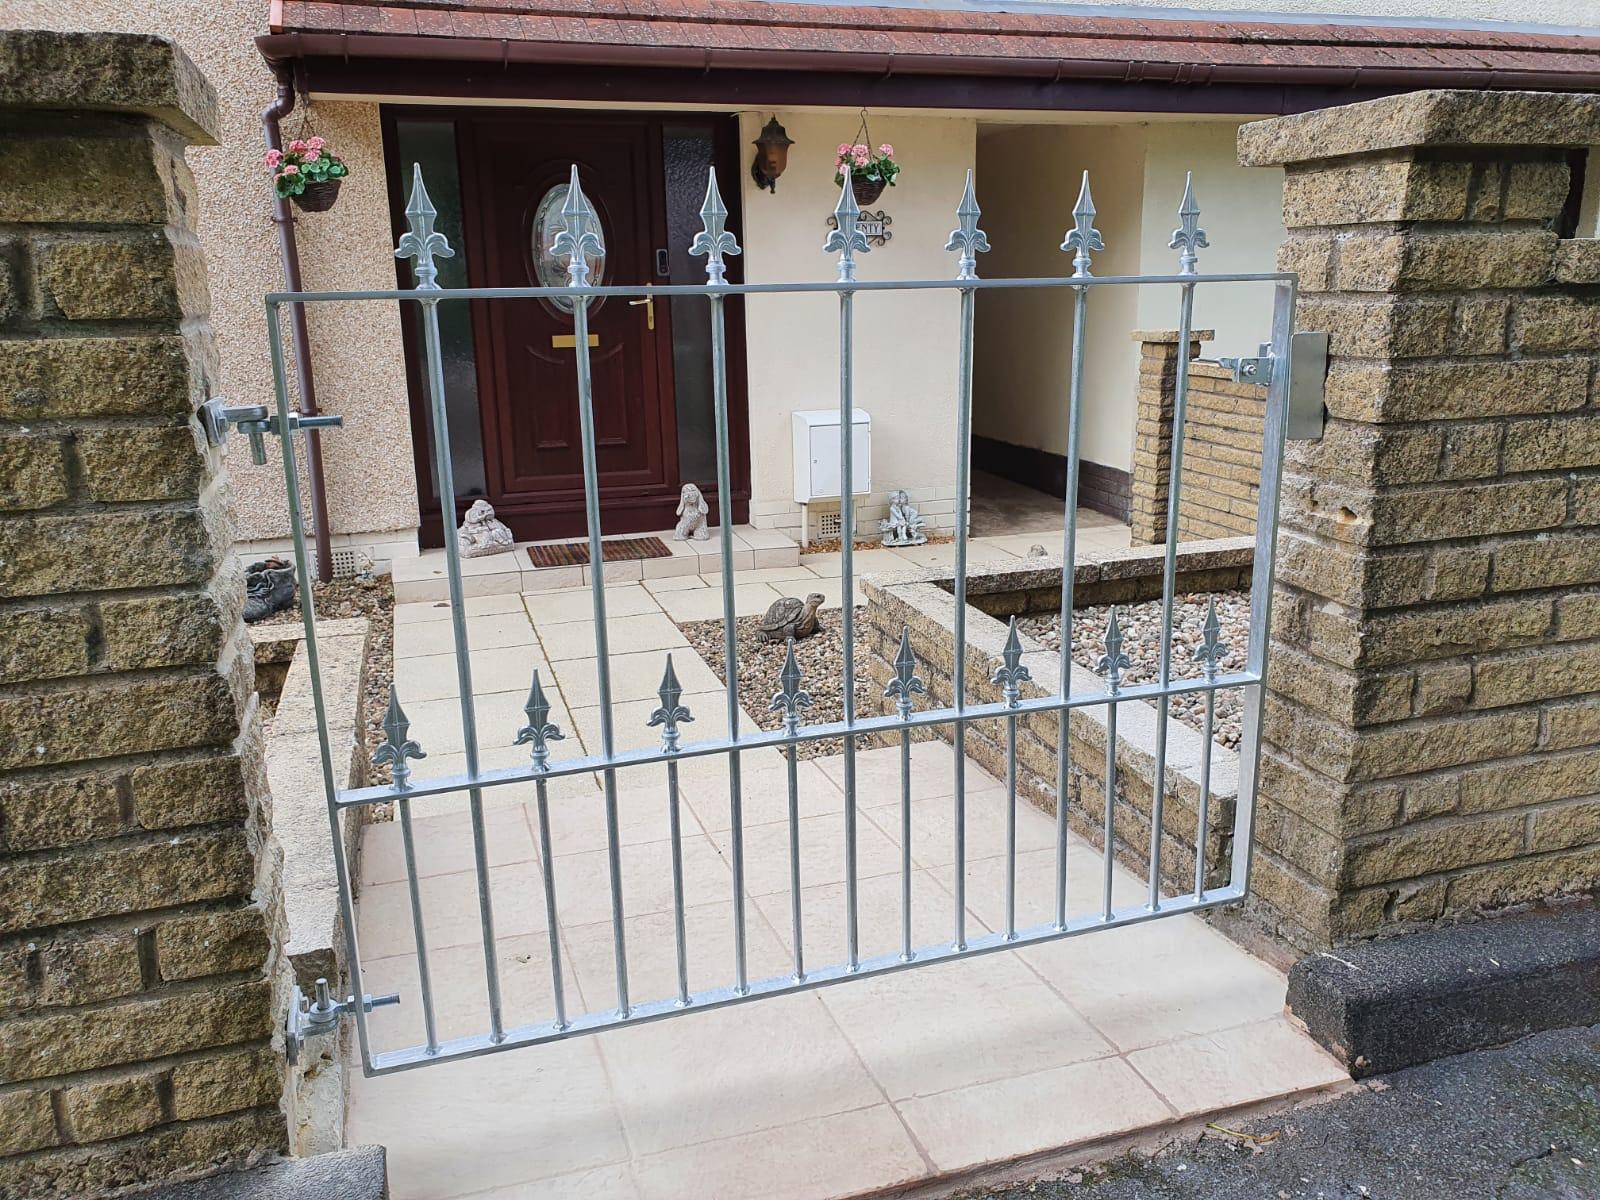 custom galvanized garden by Dain Art Iron in Ayrshire, Scotland